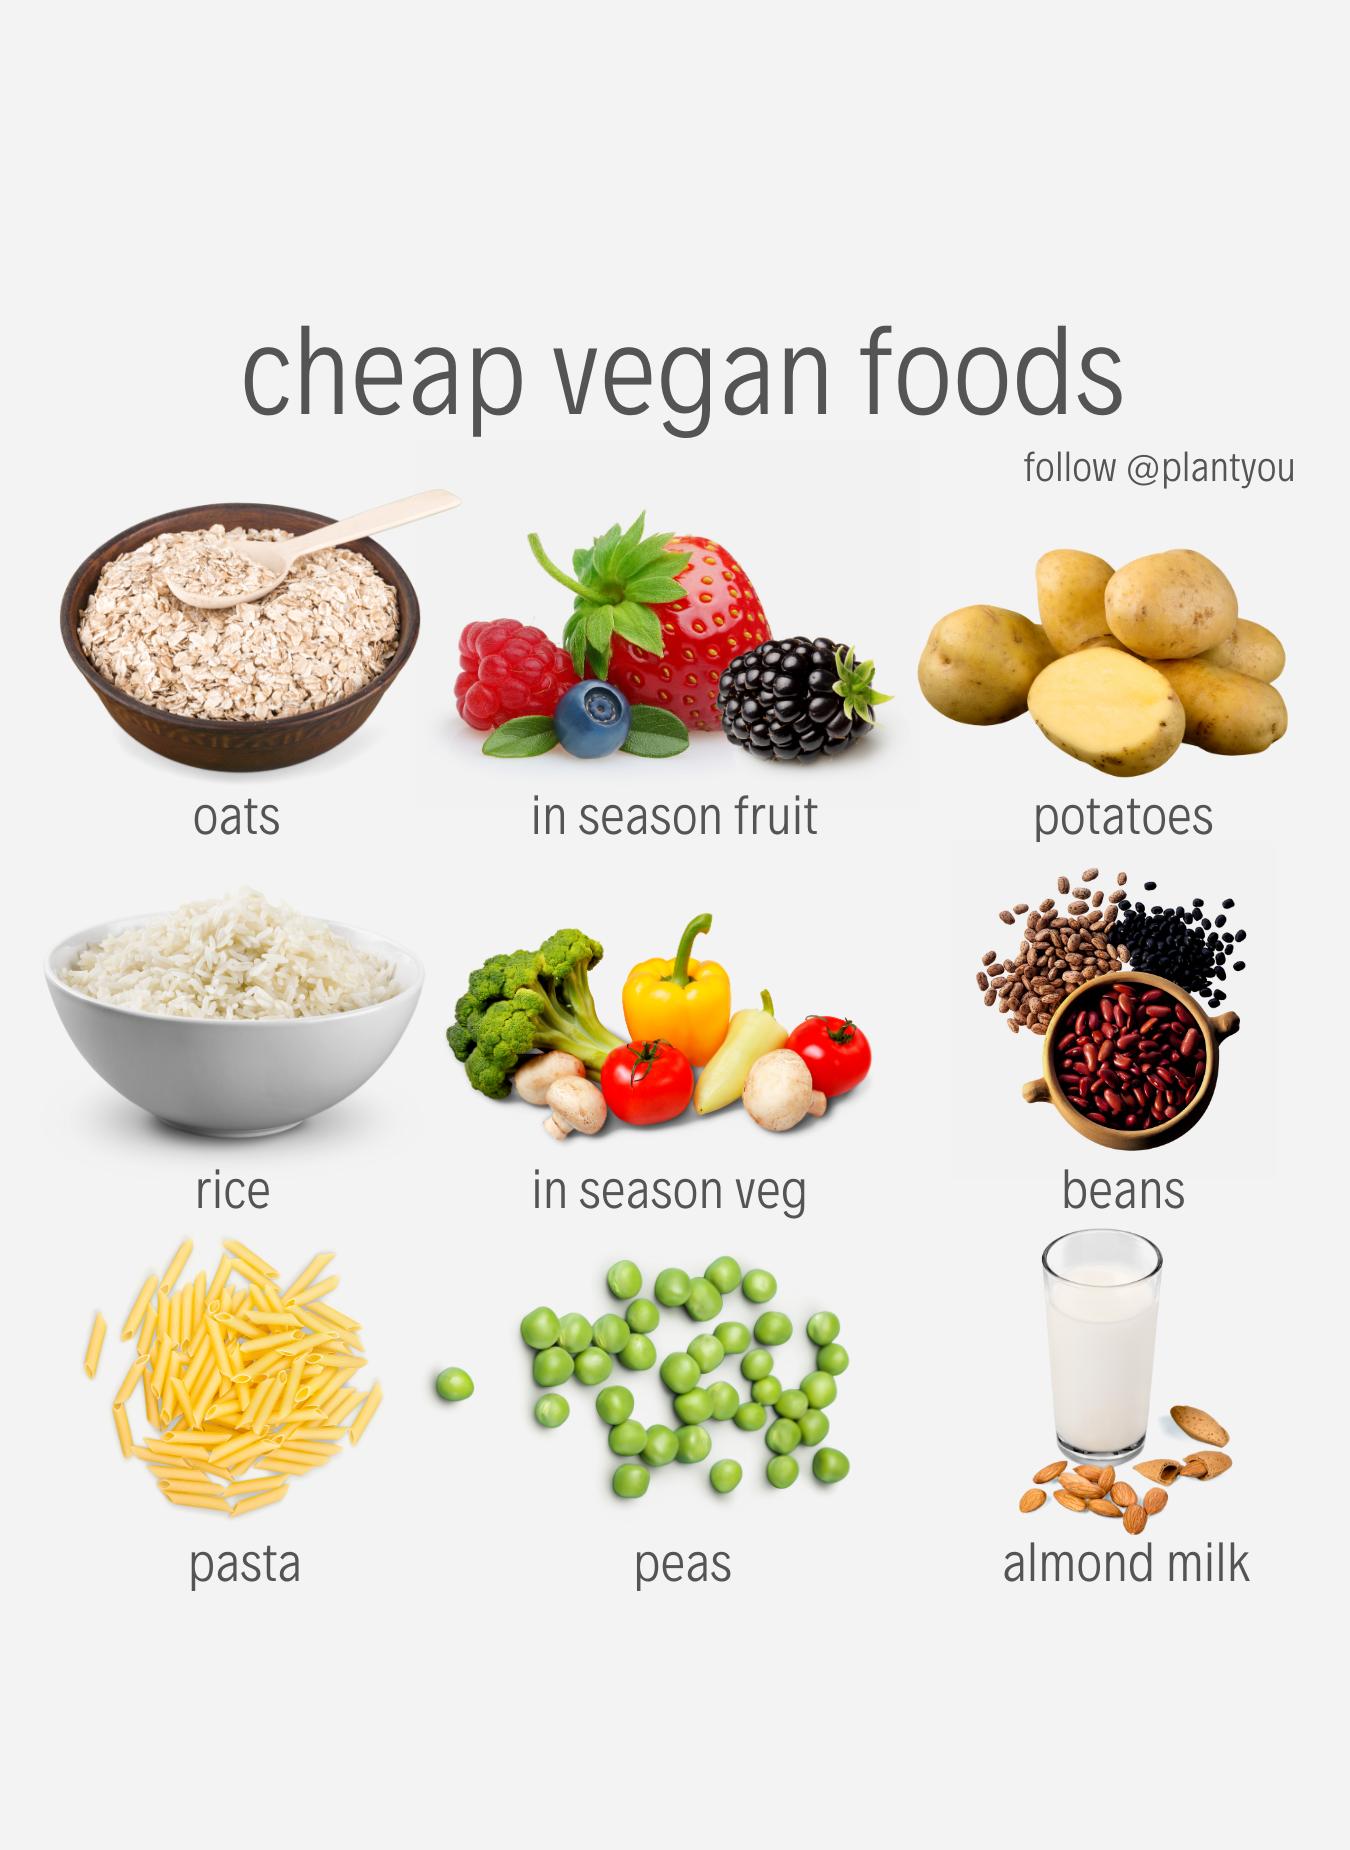 Cheap Vegan Foods How To Go Vegan Veganuary Tips Veganuary Challenge Vegan Recipes Plant Based Vegan Foods Vegan Meal Plans